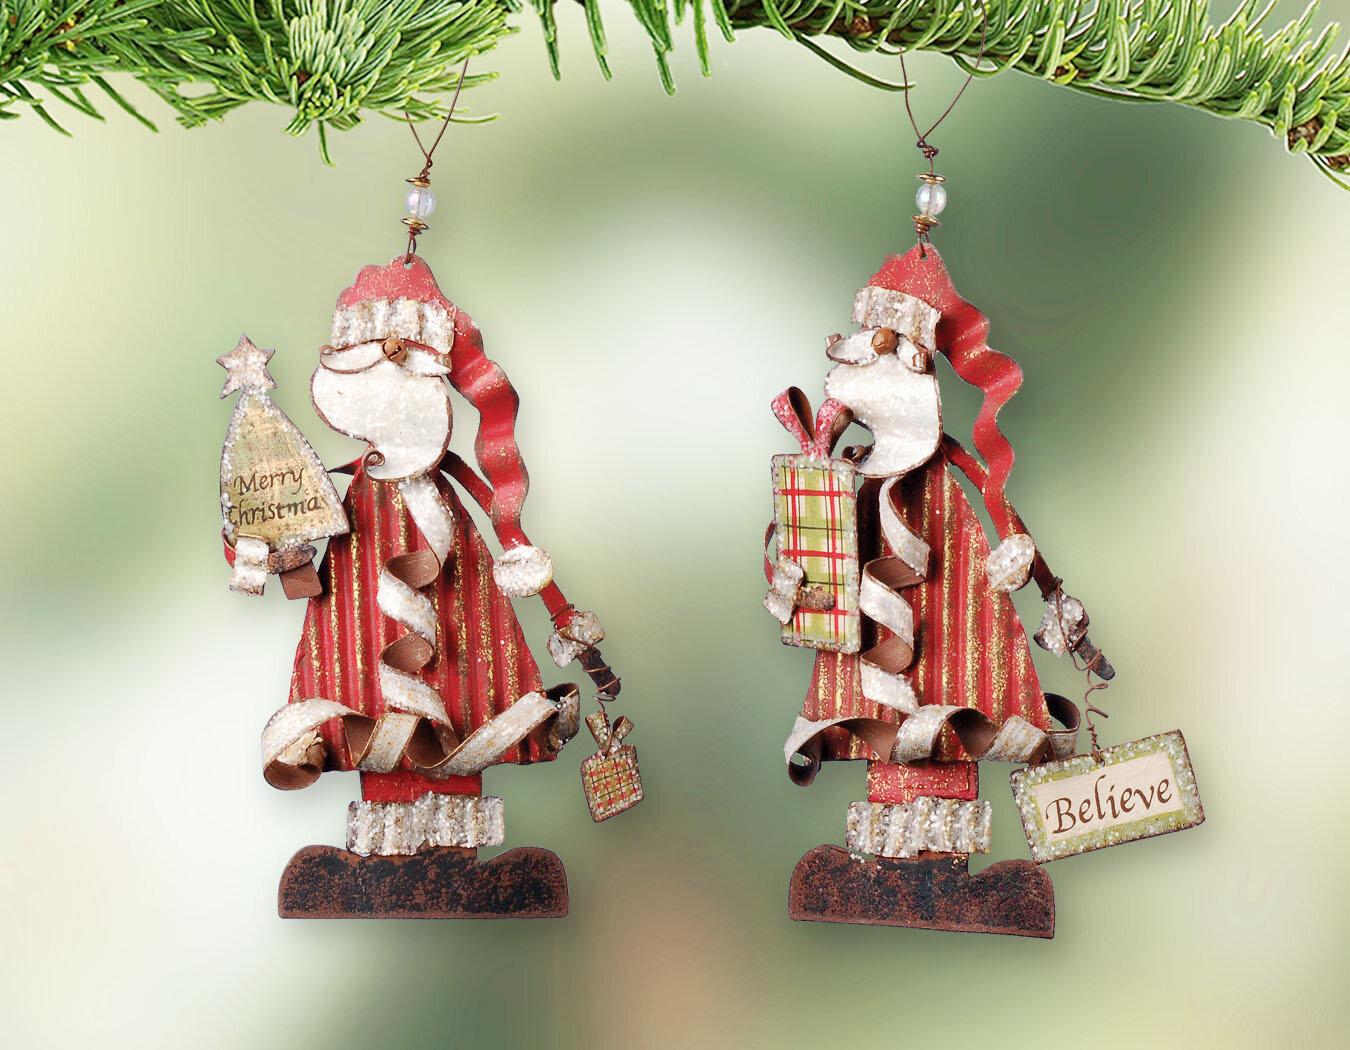 The Holiday Aisle 2 Piece Christmas Standing Santa Hanging Figurine Ornament Set Wayfair